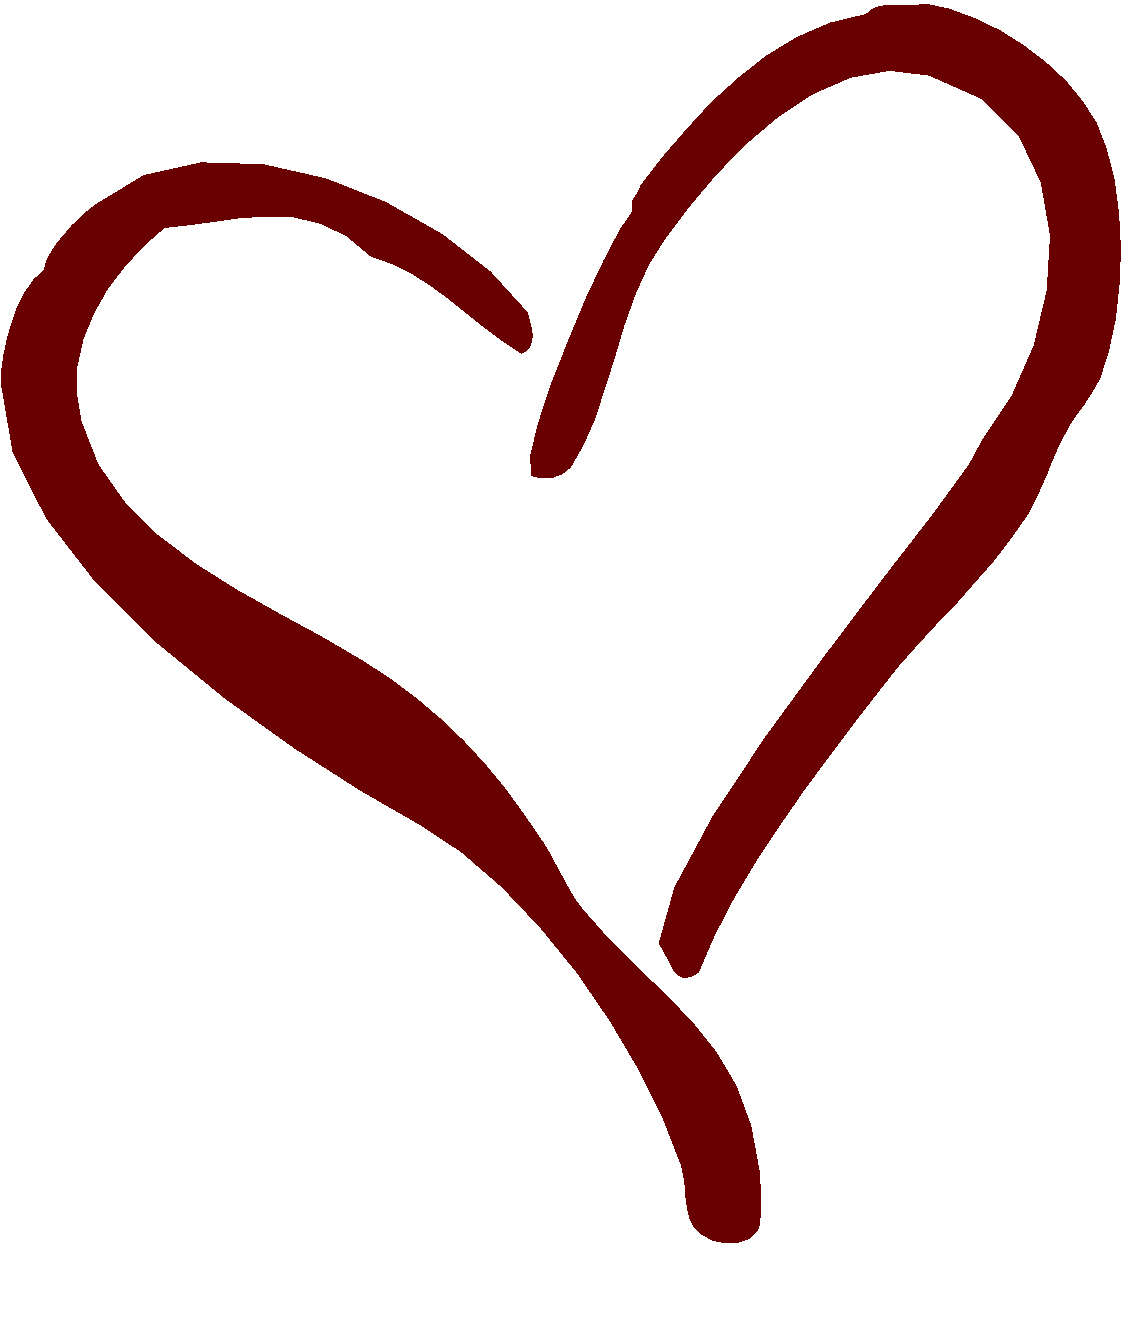 1129x1342 Black Heart Clipart